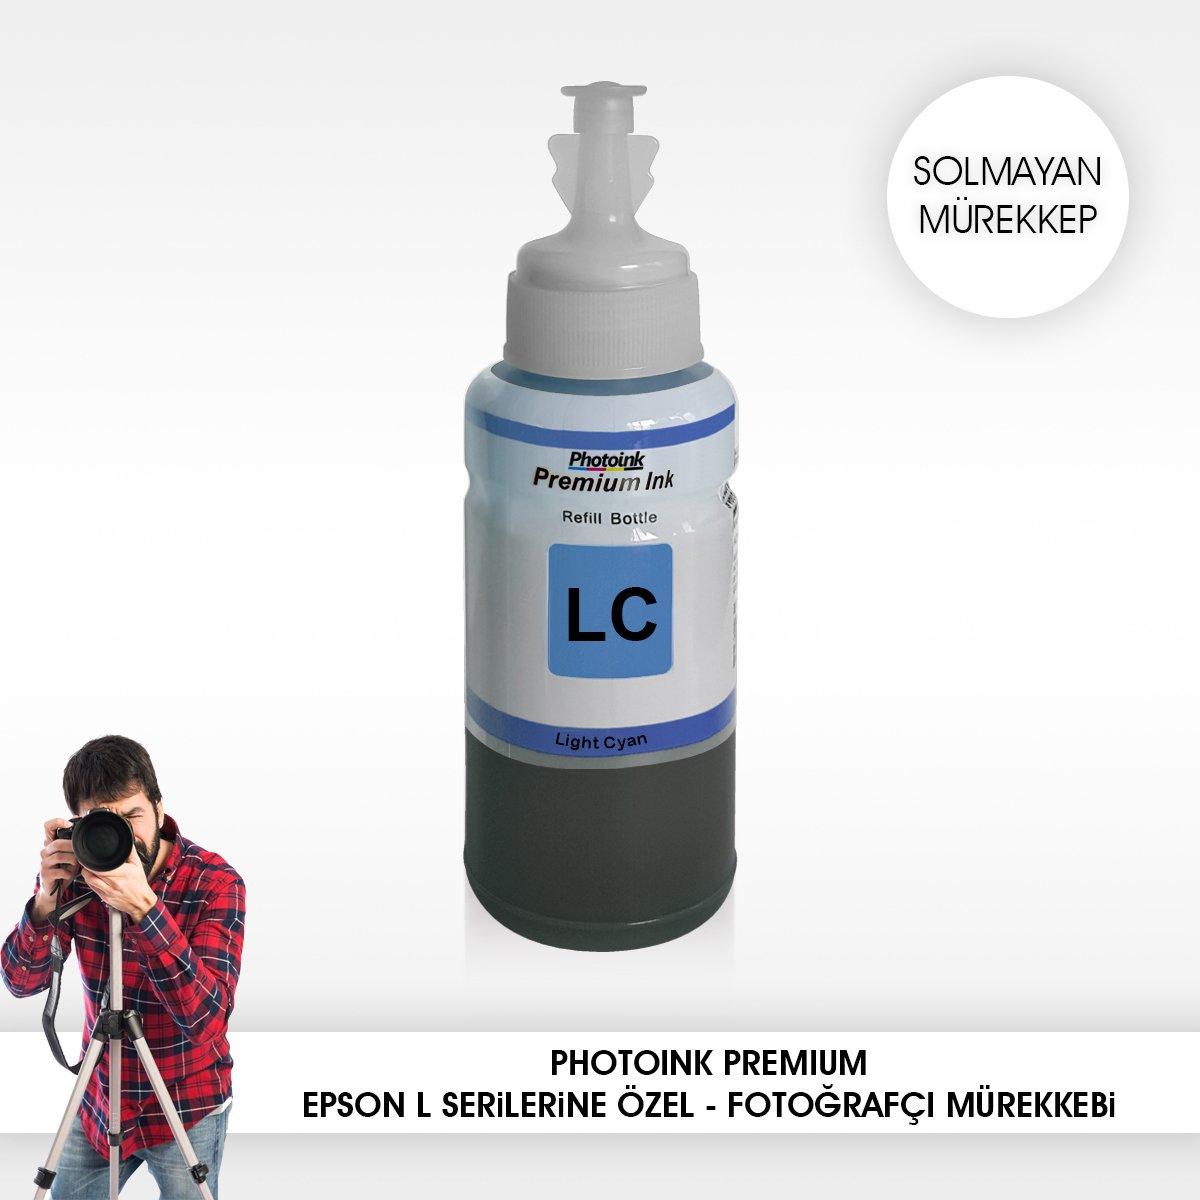 Epson, compatible con 70 ml, tinta azul claro sin decoloración (6 colores para impresoras) -L800/L805/L810/L850/L1300/L1800/l382/l386/l455/1455